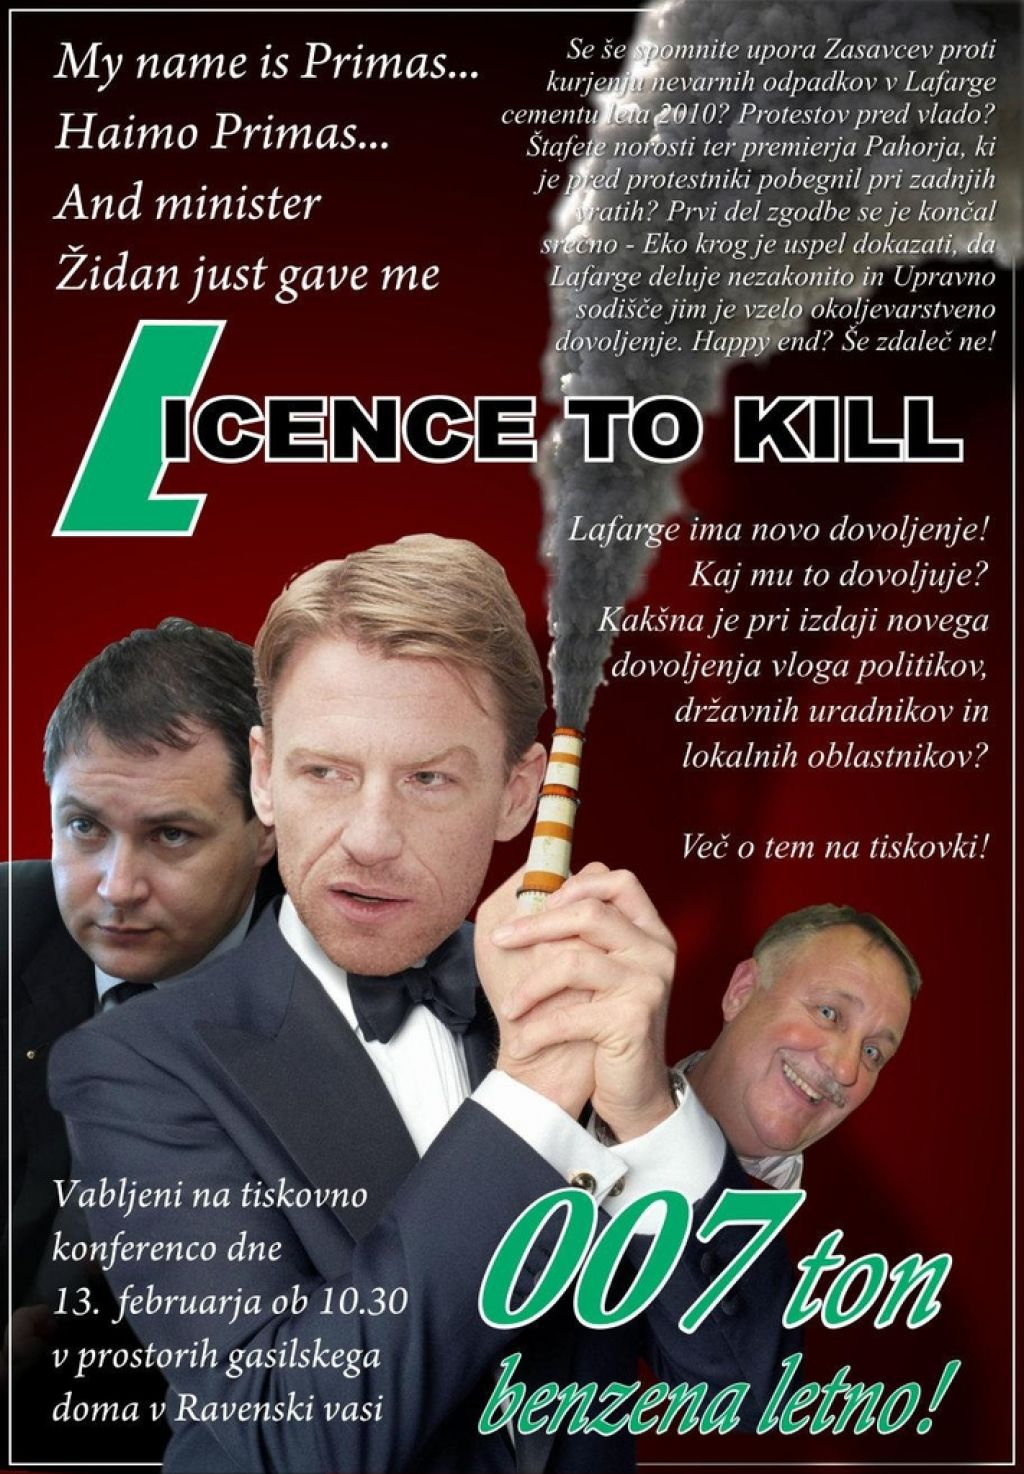 Eko krog: Dovoljenje za Lafarge je dovoljenje za ubijanje